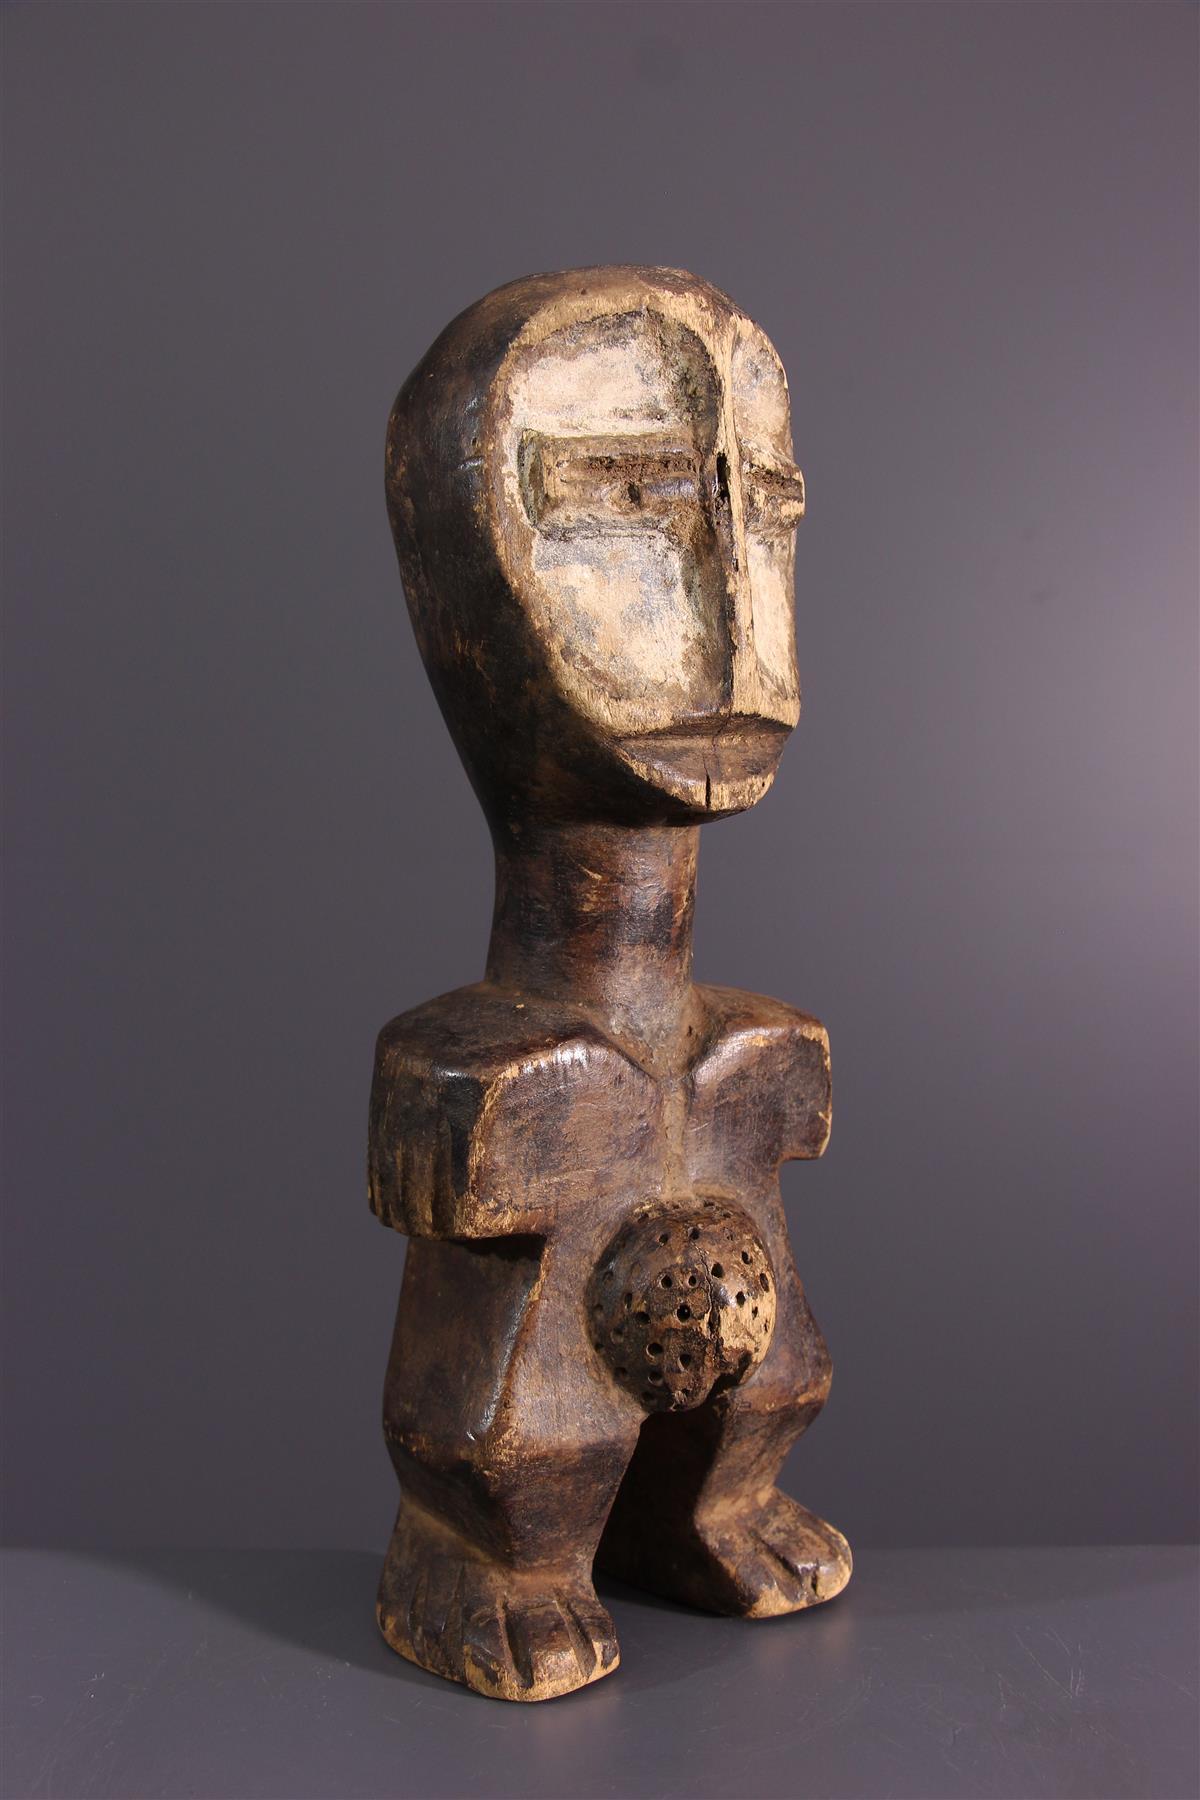 Figurines Lega - African art